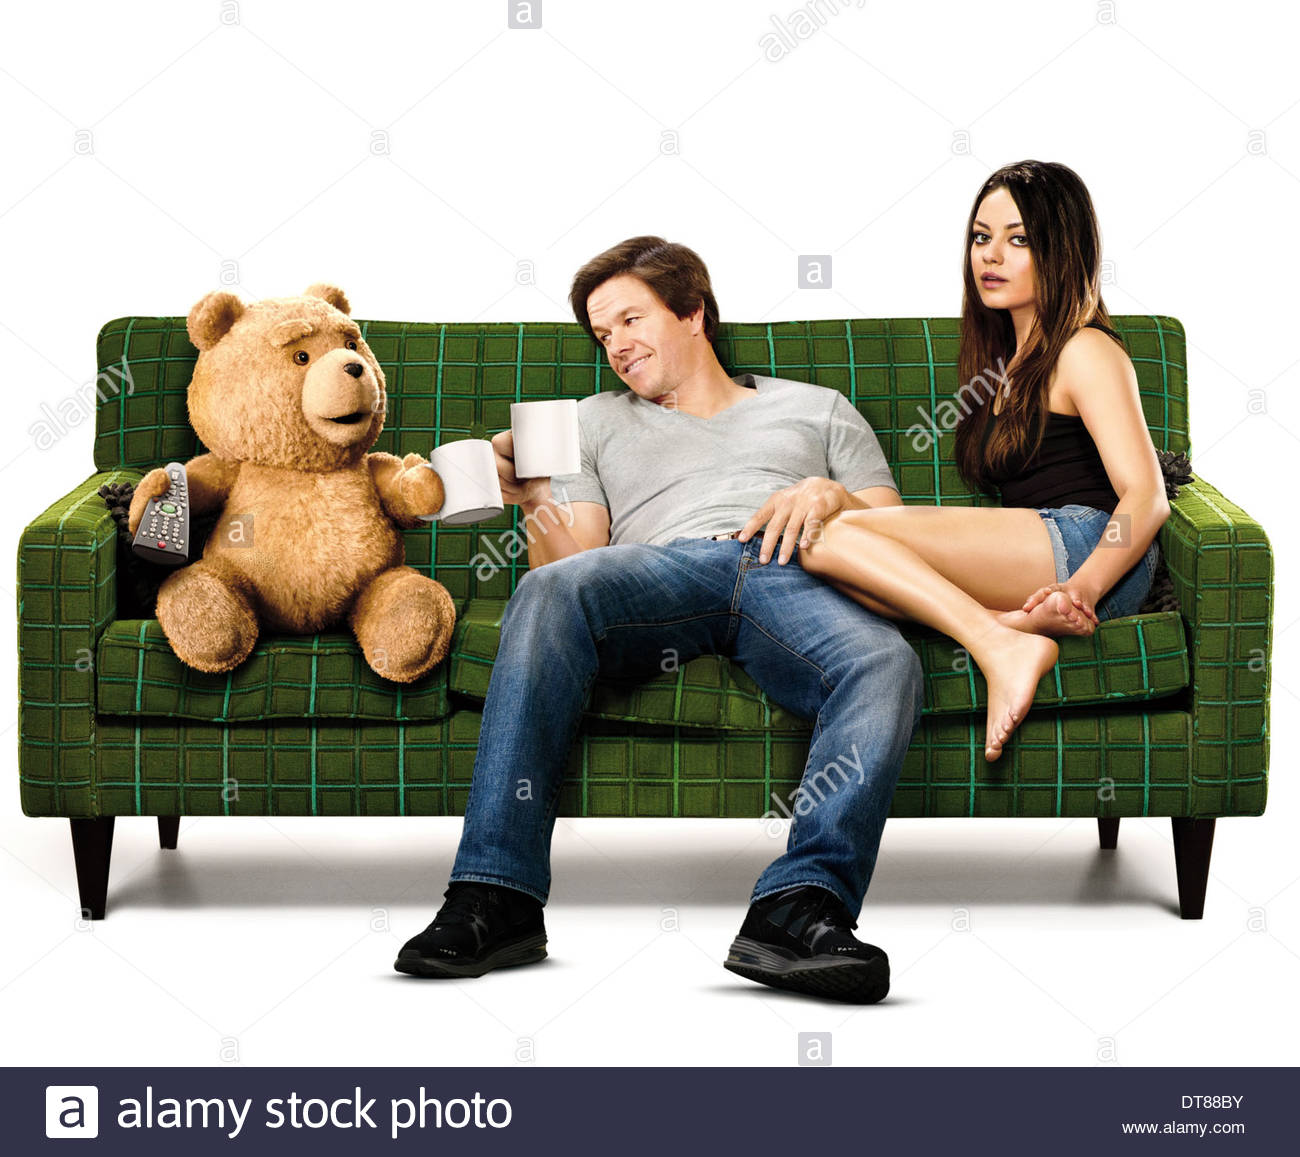 TED MARK WAHLBERG & MILA KUNIS TED (2012) Stock Photo